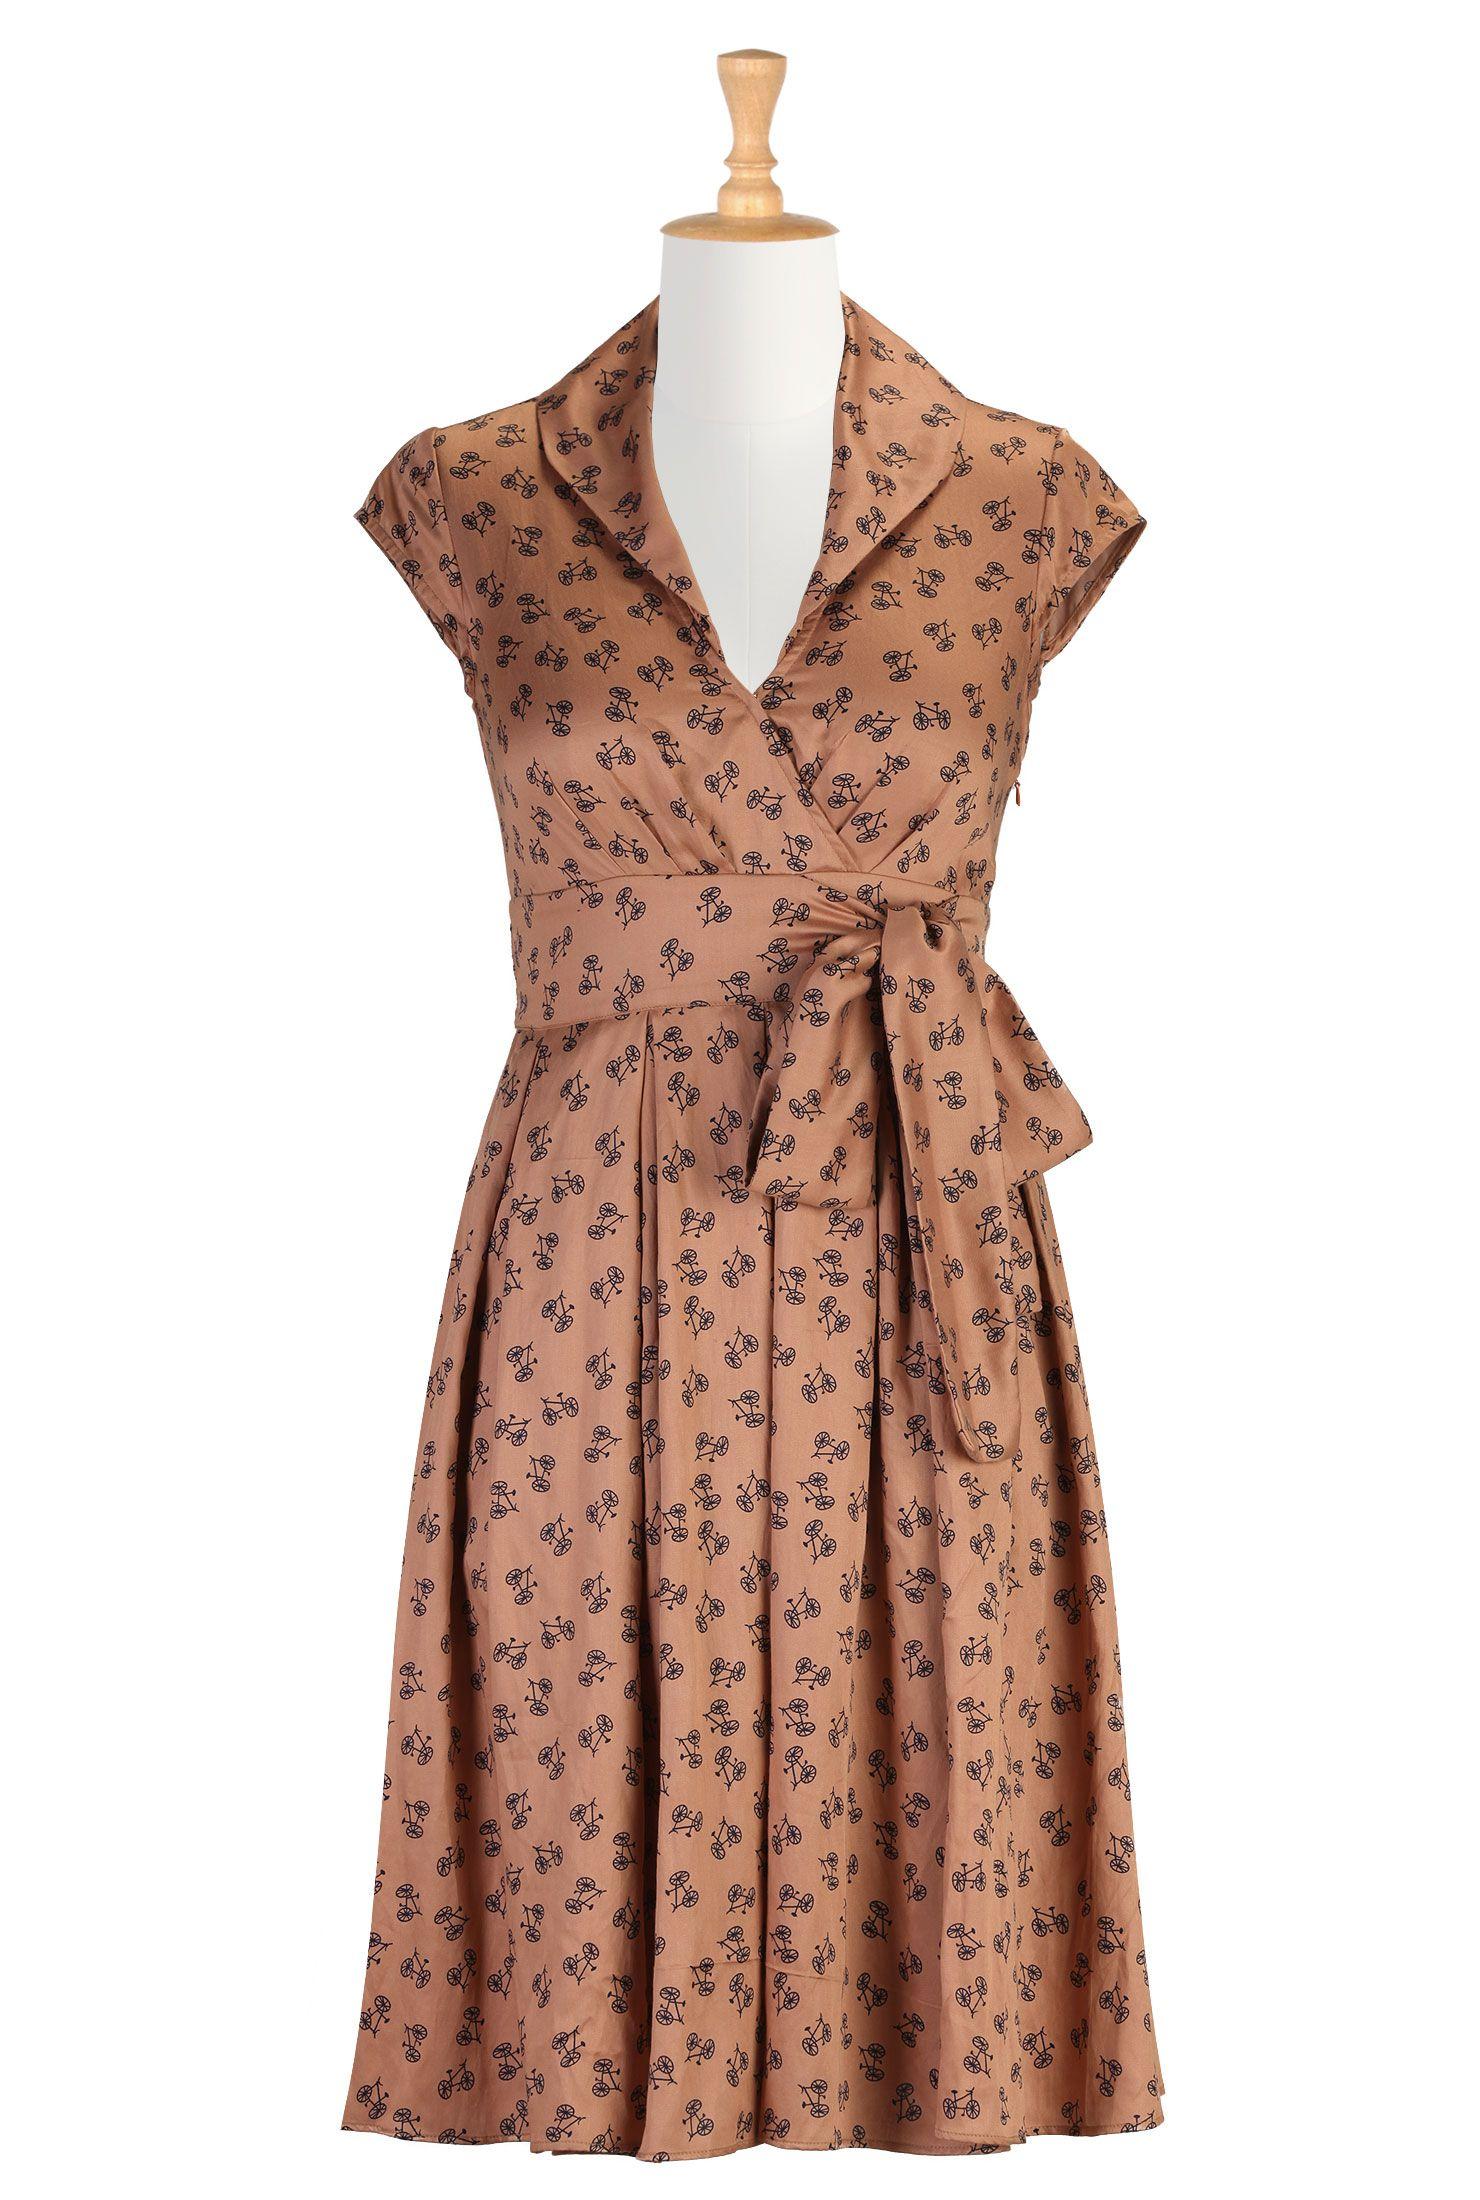 Casual Women Dress, Vintage Looking Dresses Shop women's designer ...